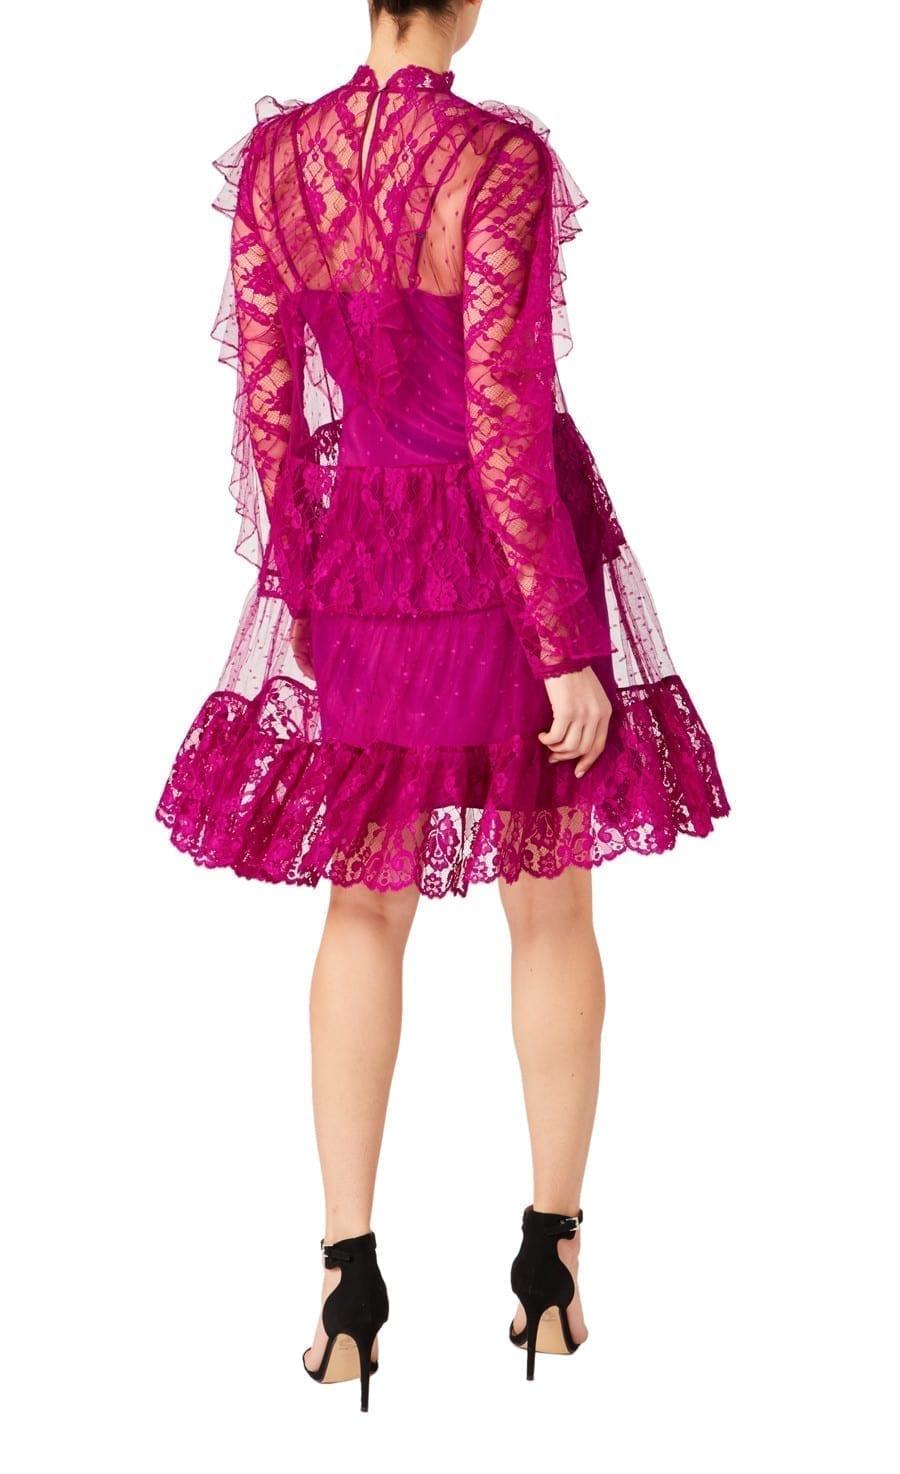 TEMPERLEY LONDON Florence Short Dress - We Select Dresses